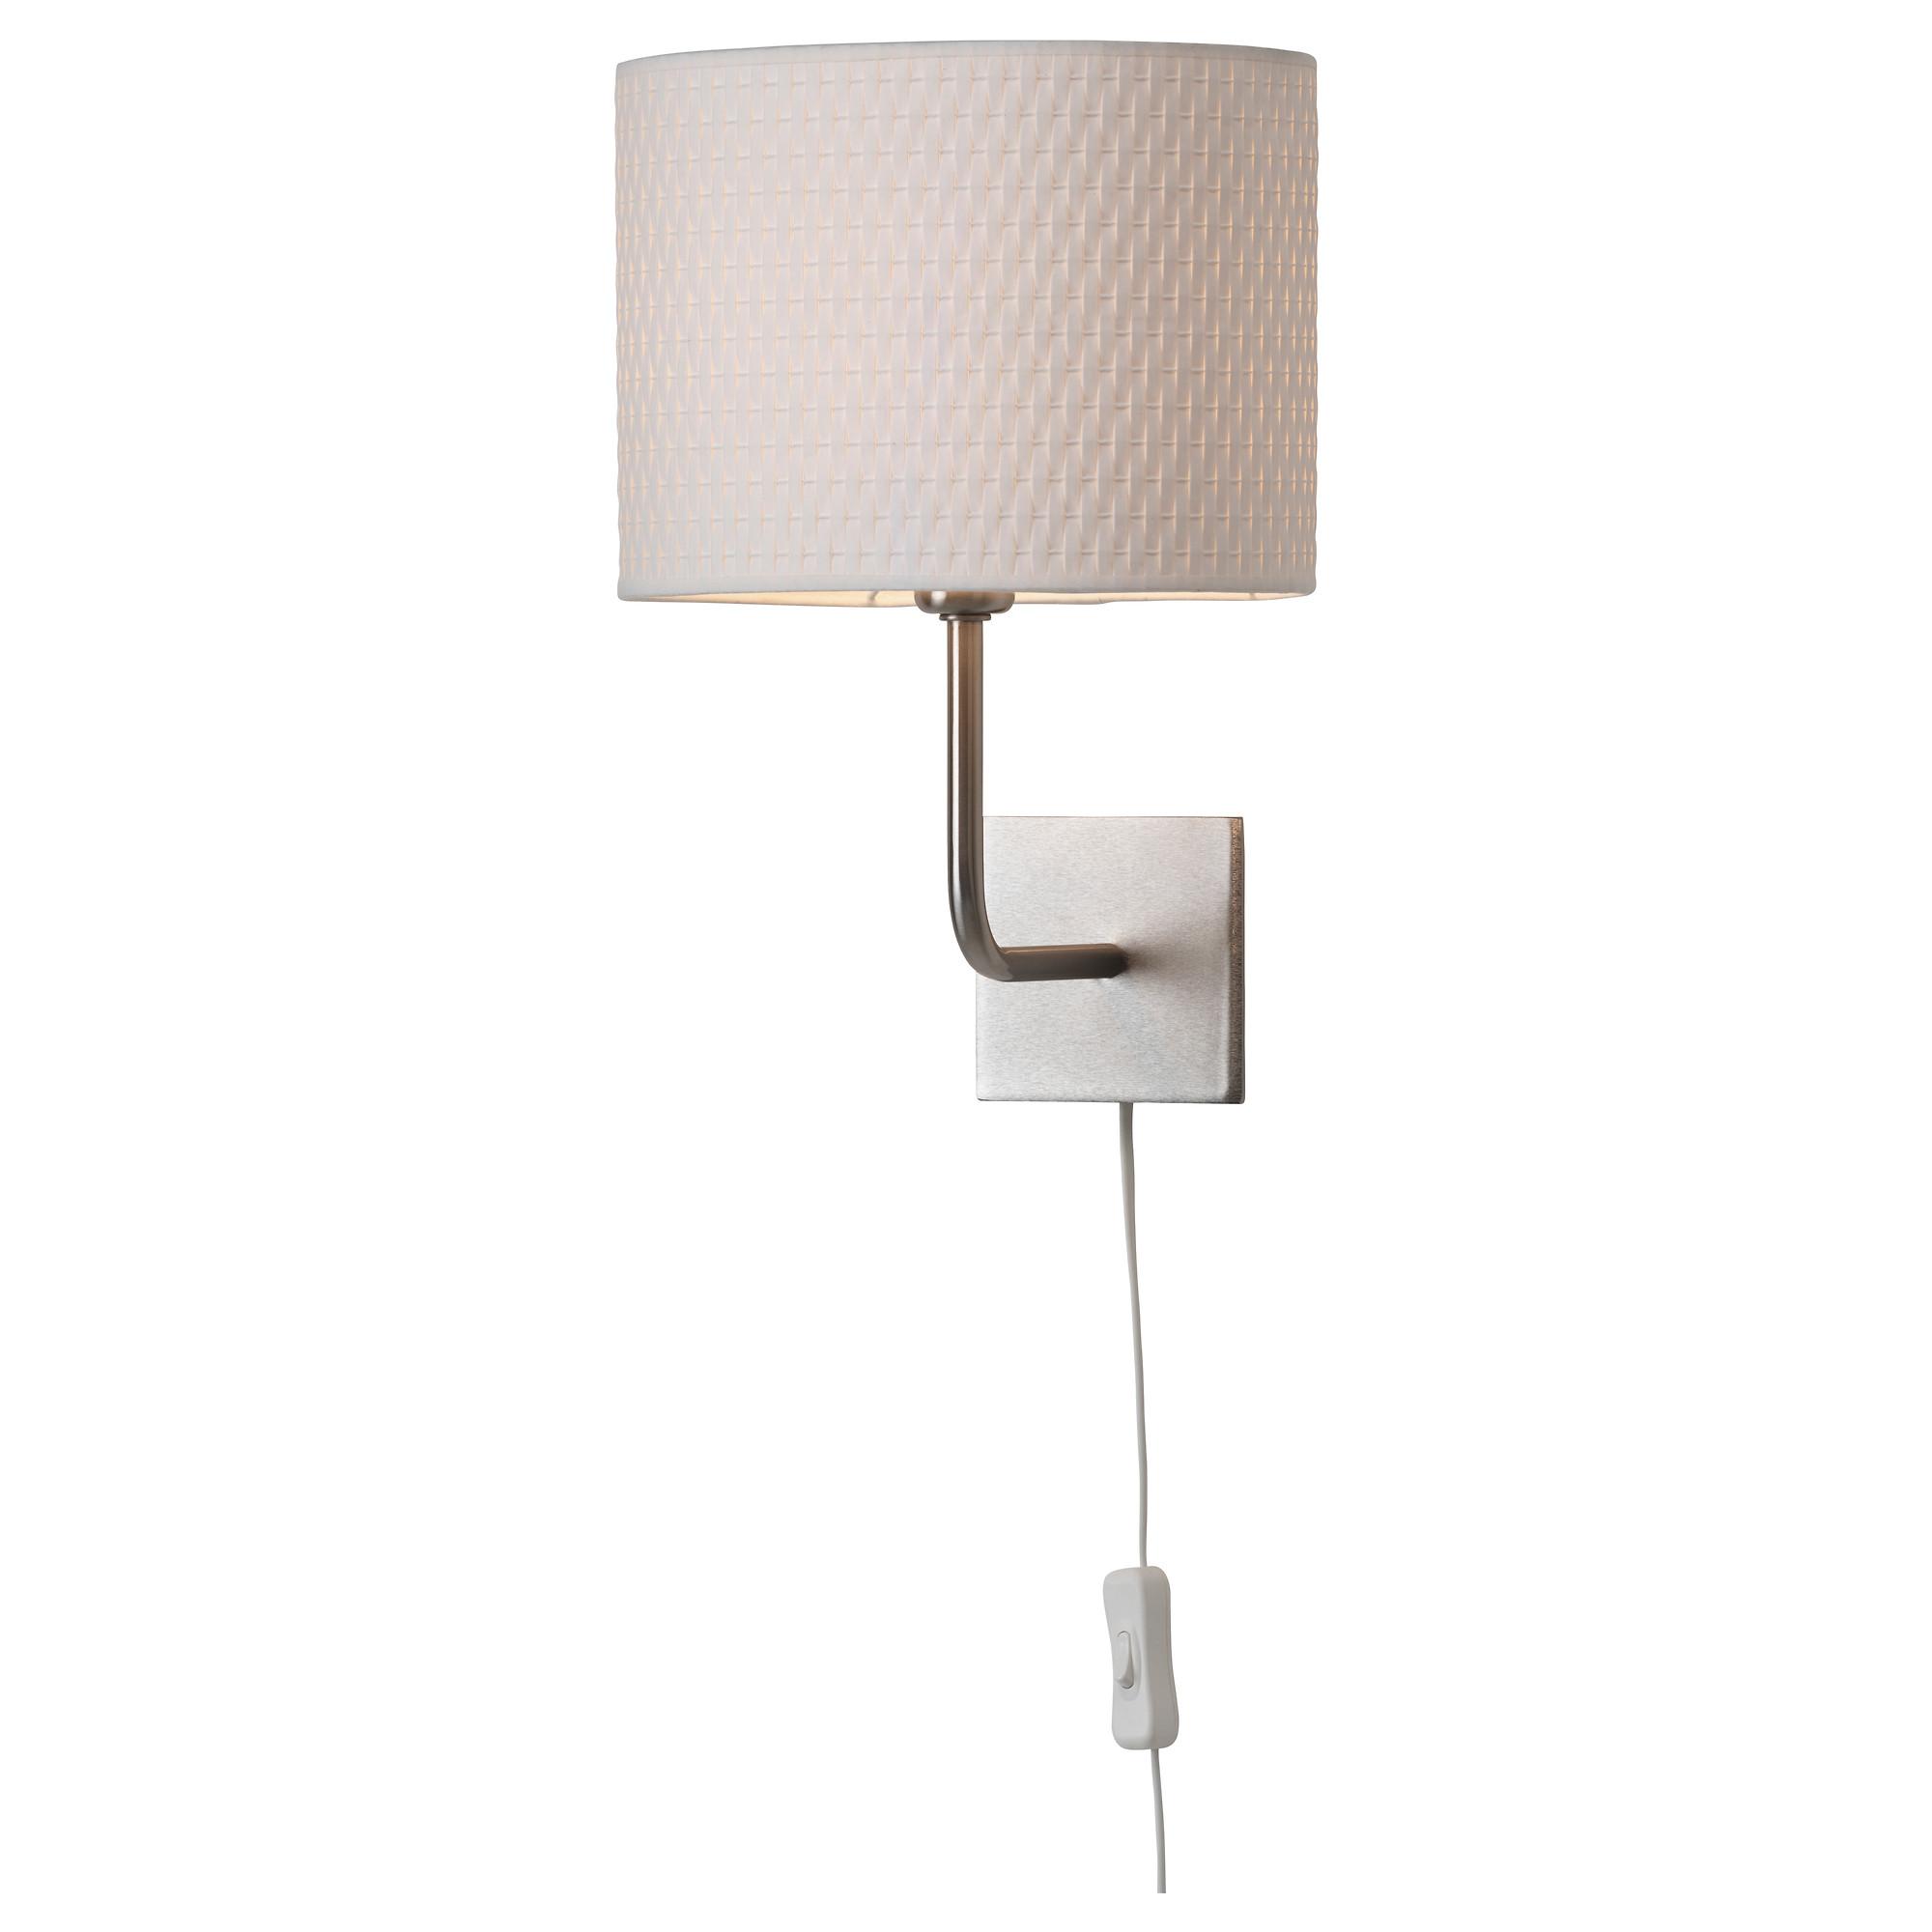 Feel The Magic Of Pull Cord Wall Lights Warisan Lighting